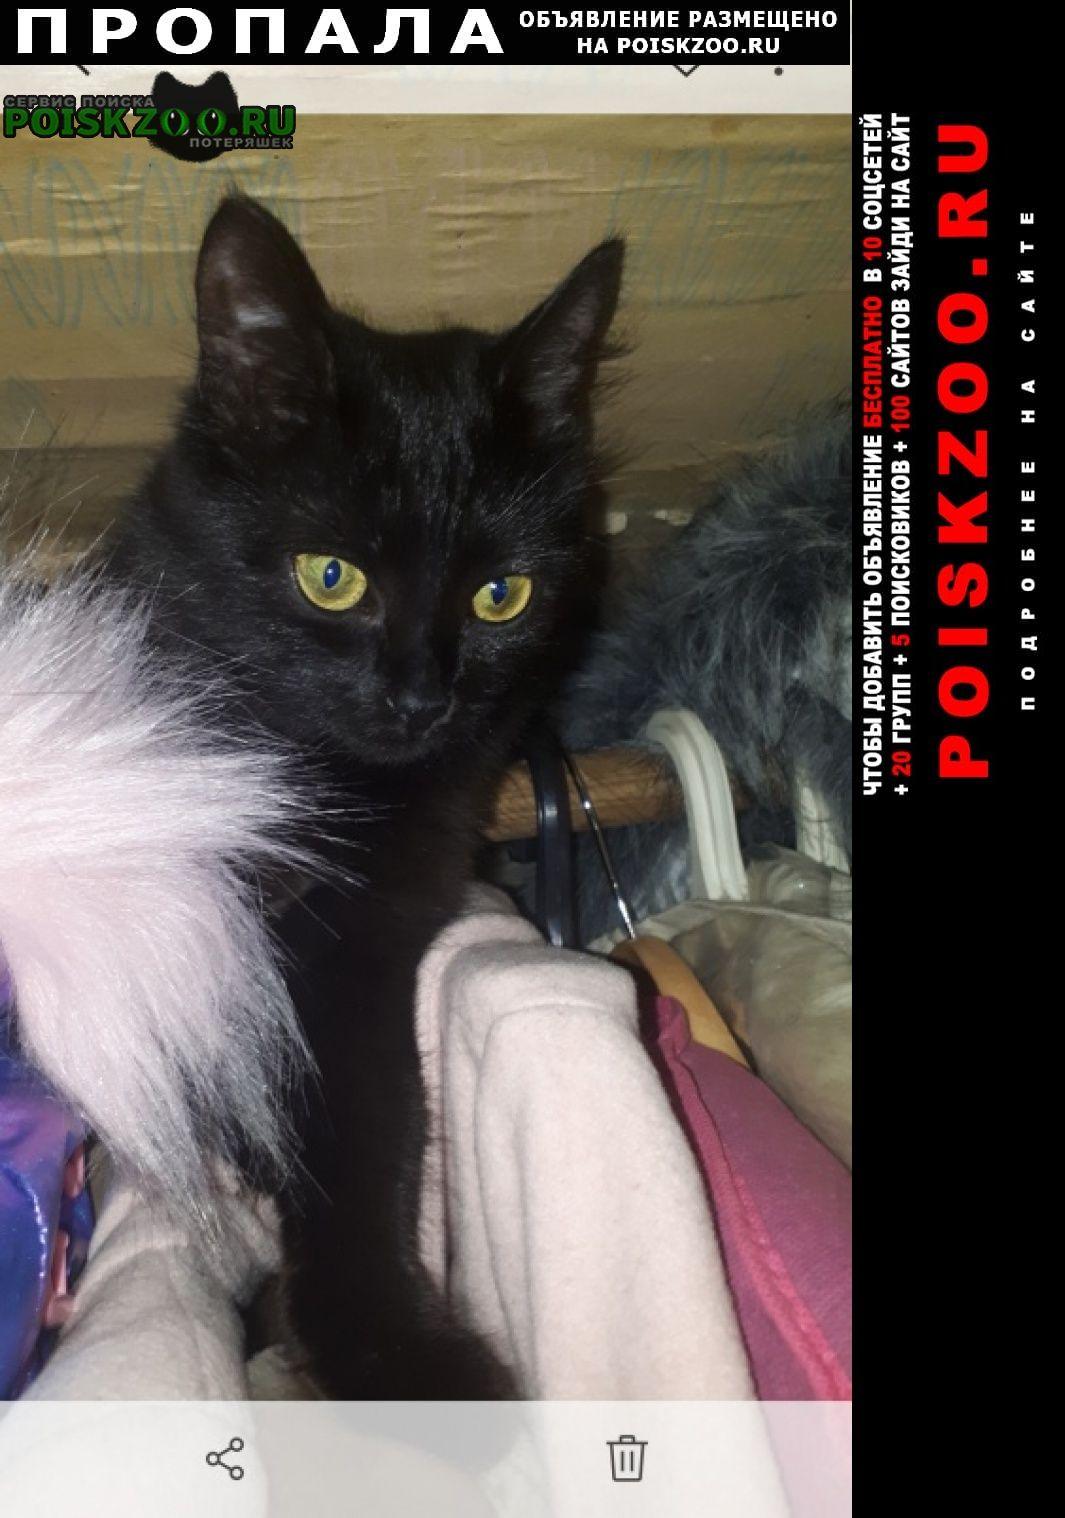 Пропала кошка черная кошечка Москва